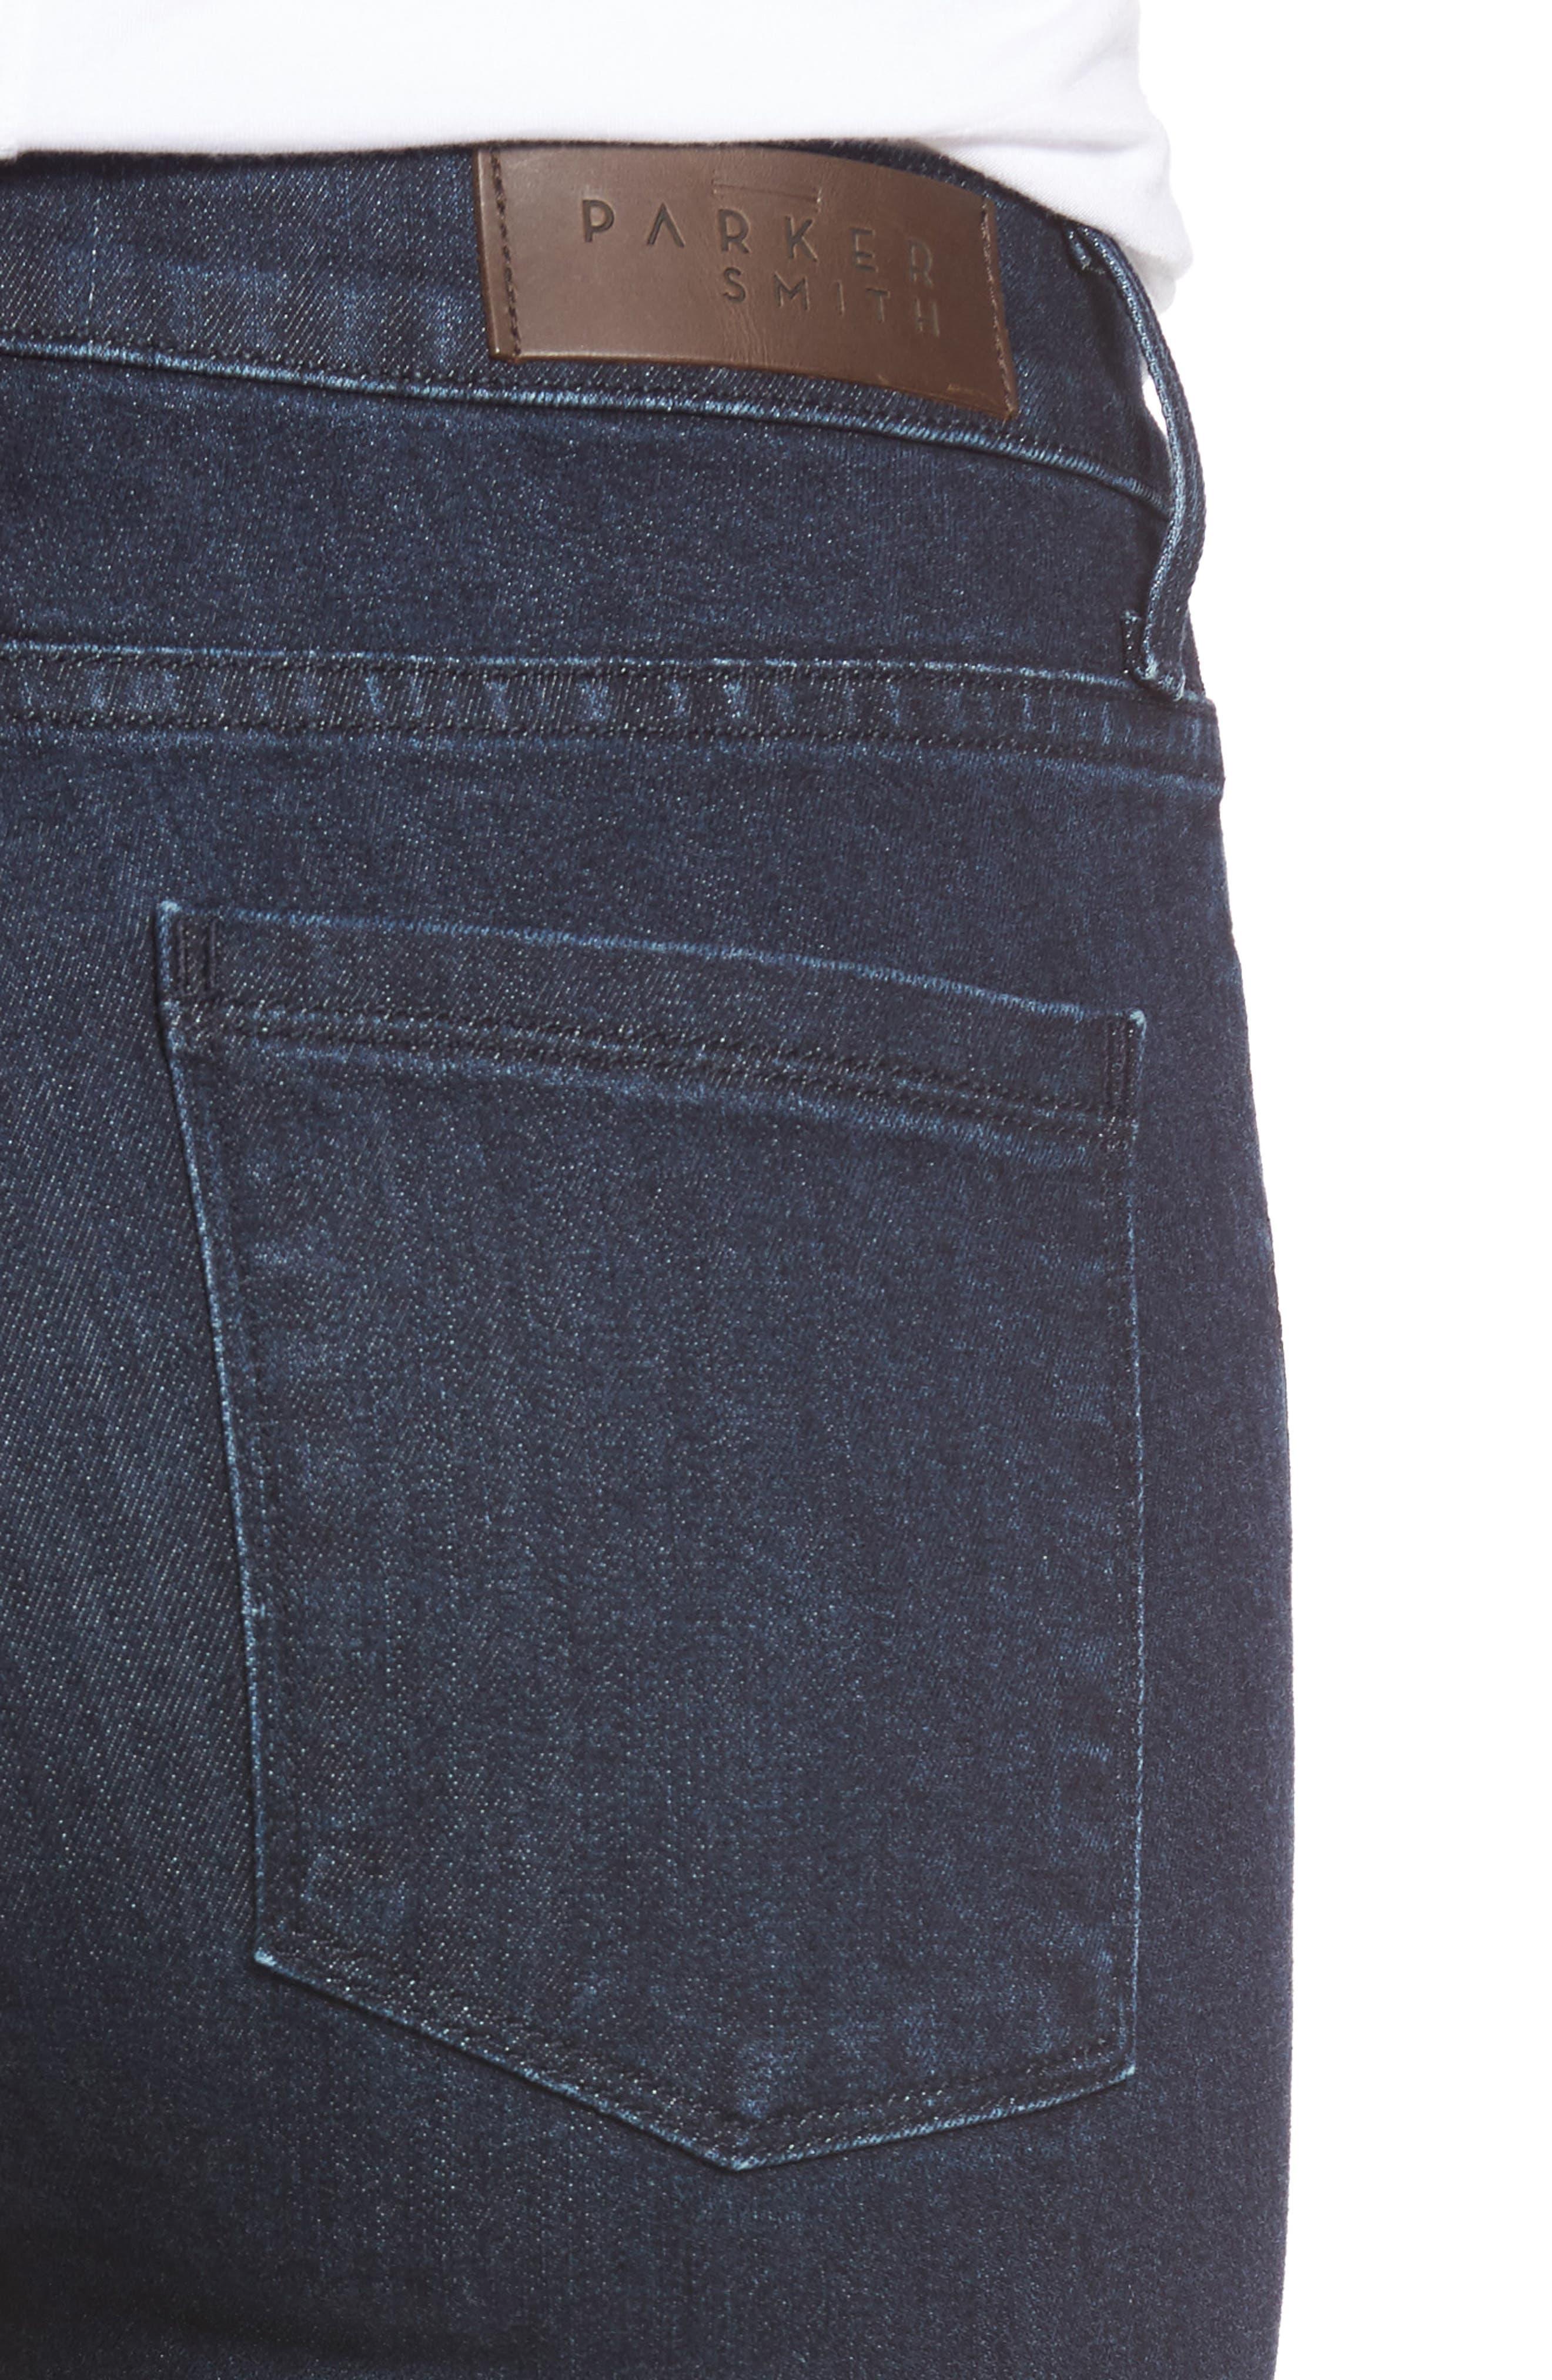 Bombshell High Waist Stretch Skinny Jeans,                             Alternate thumbnail 11, color,